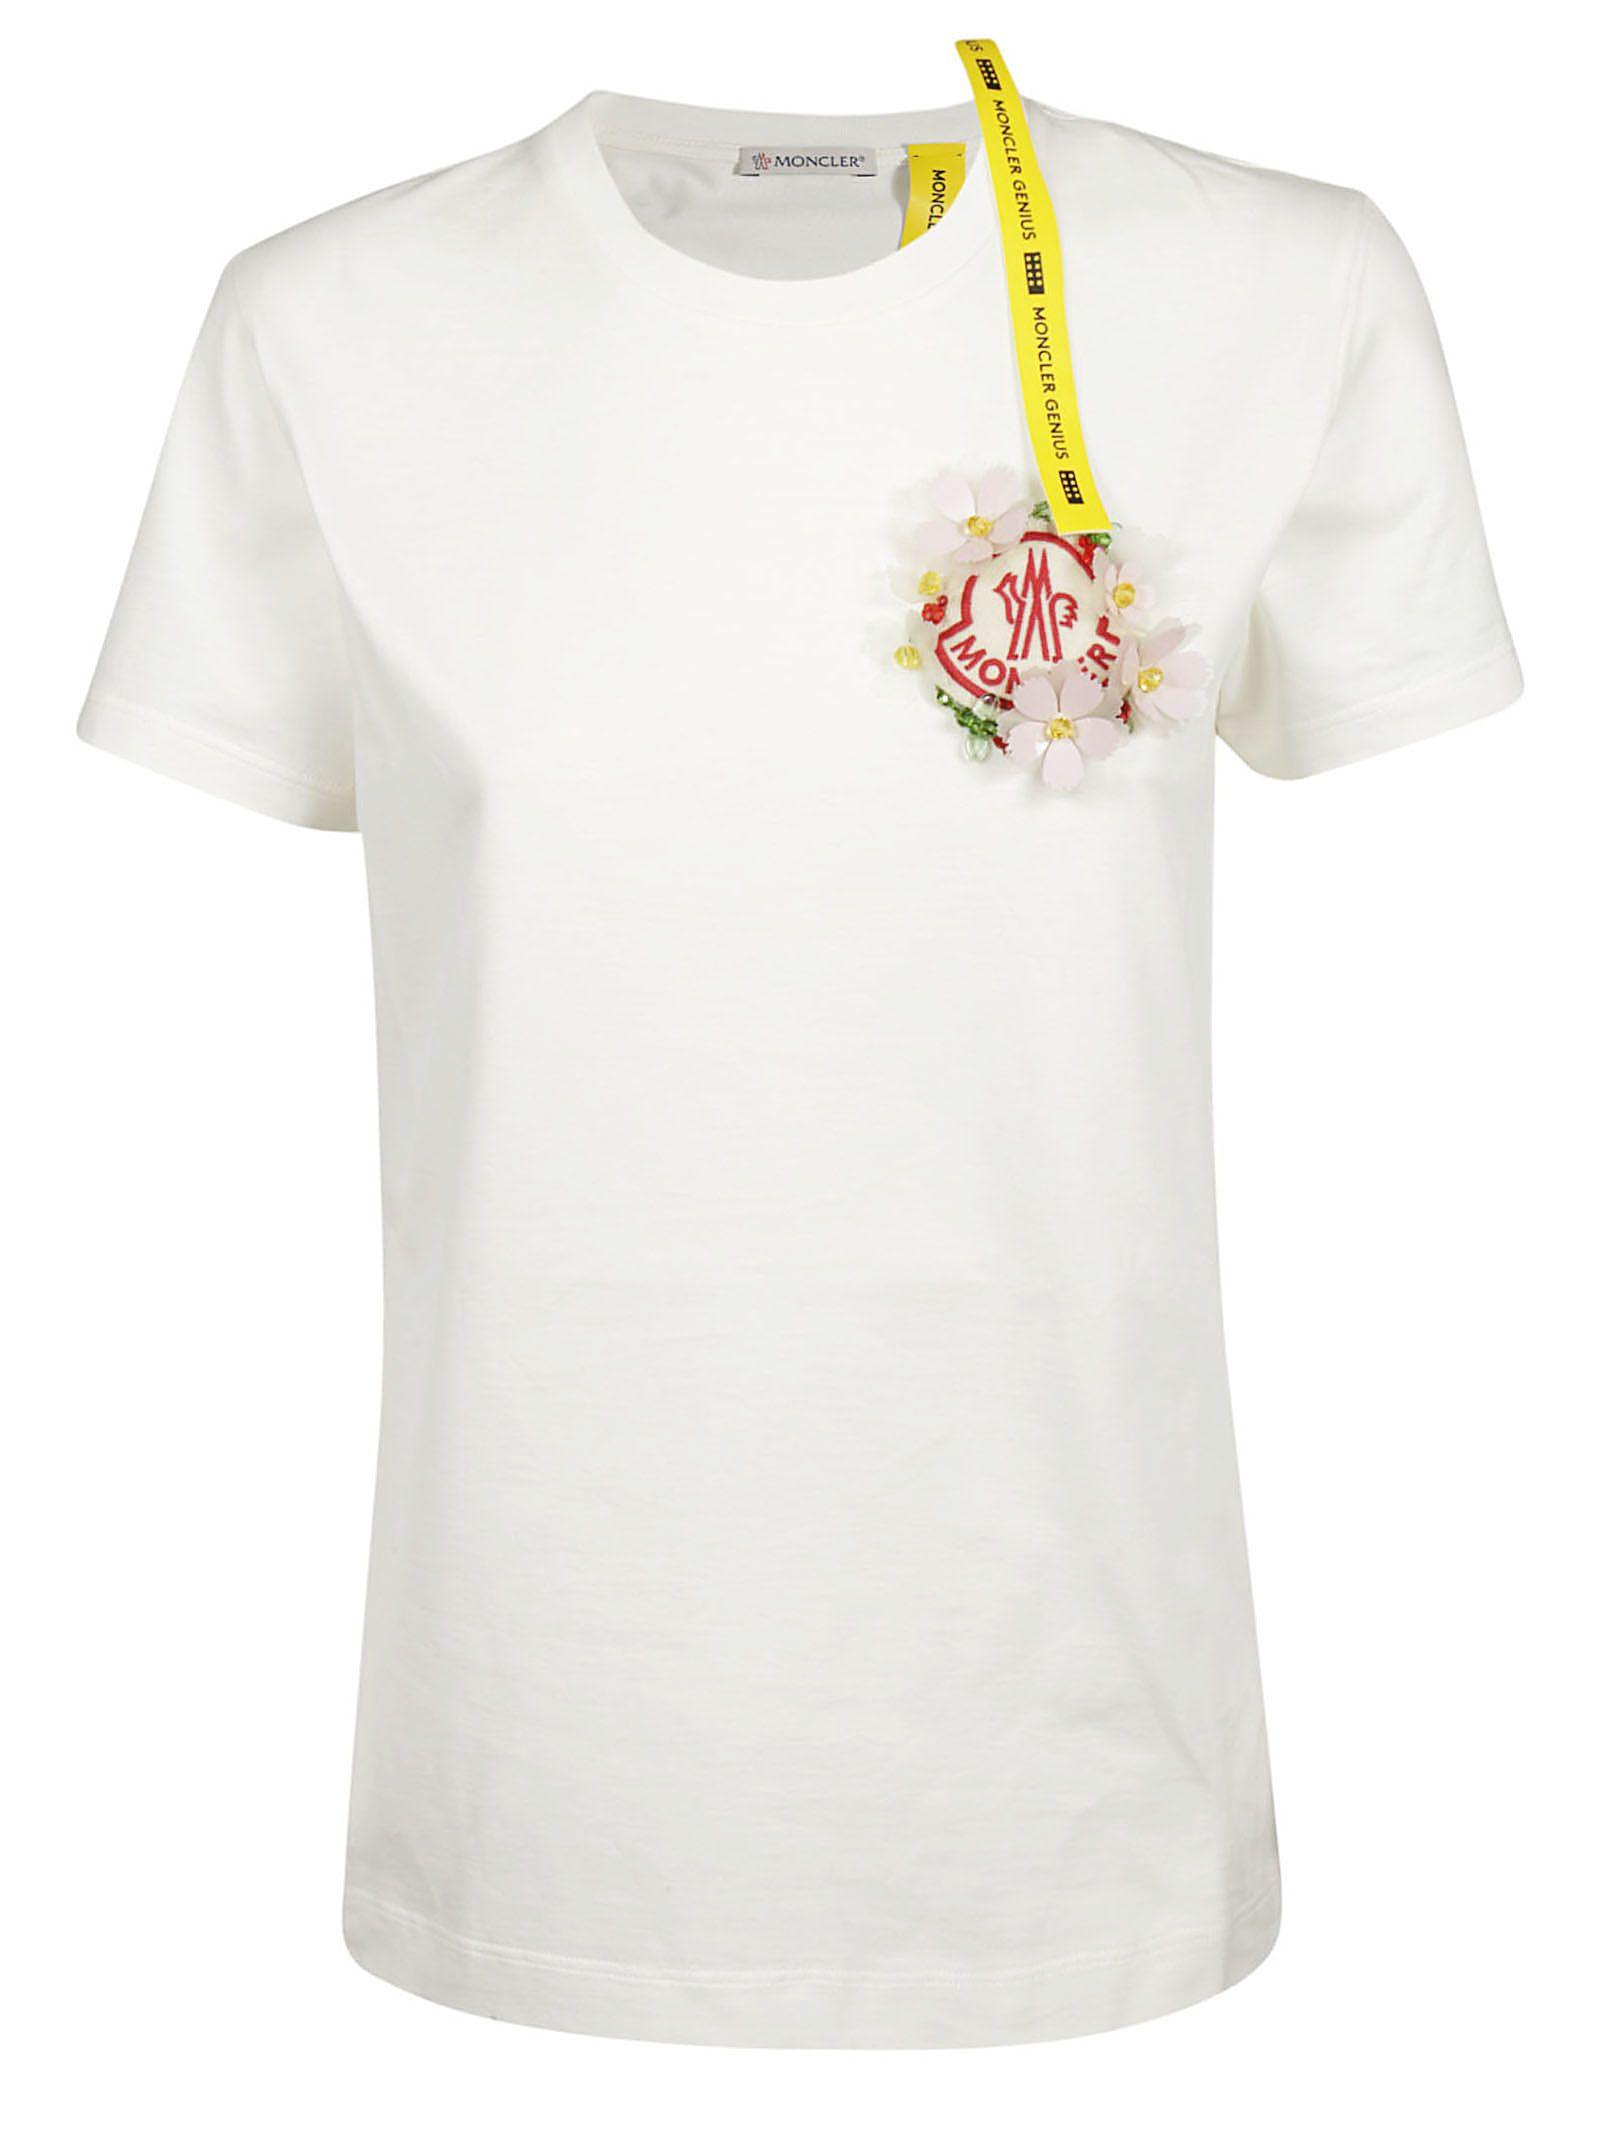 white moncler t shirt